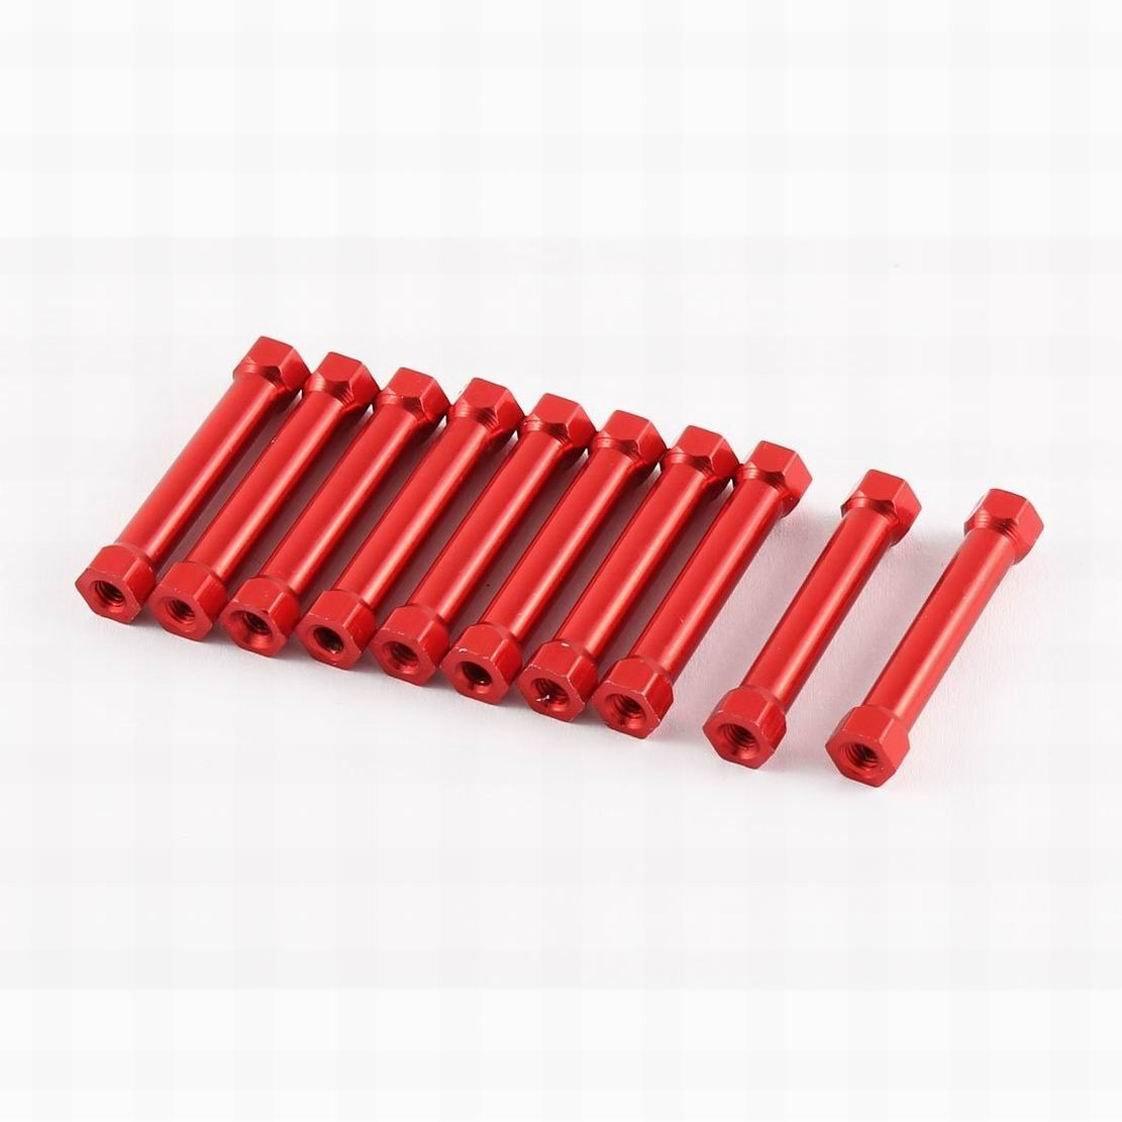 Ucland 10pcs M3 x 32 6mm Female Thread Red Hexagonal Aluminum Column